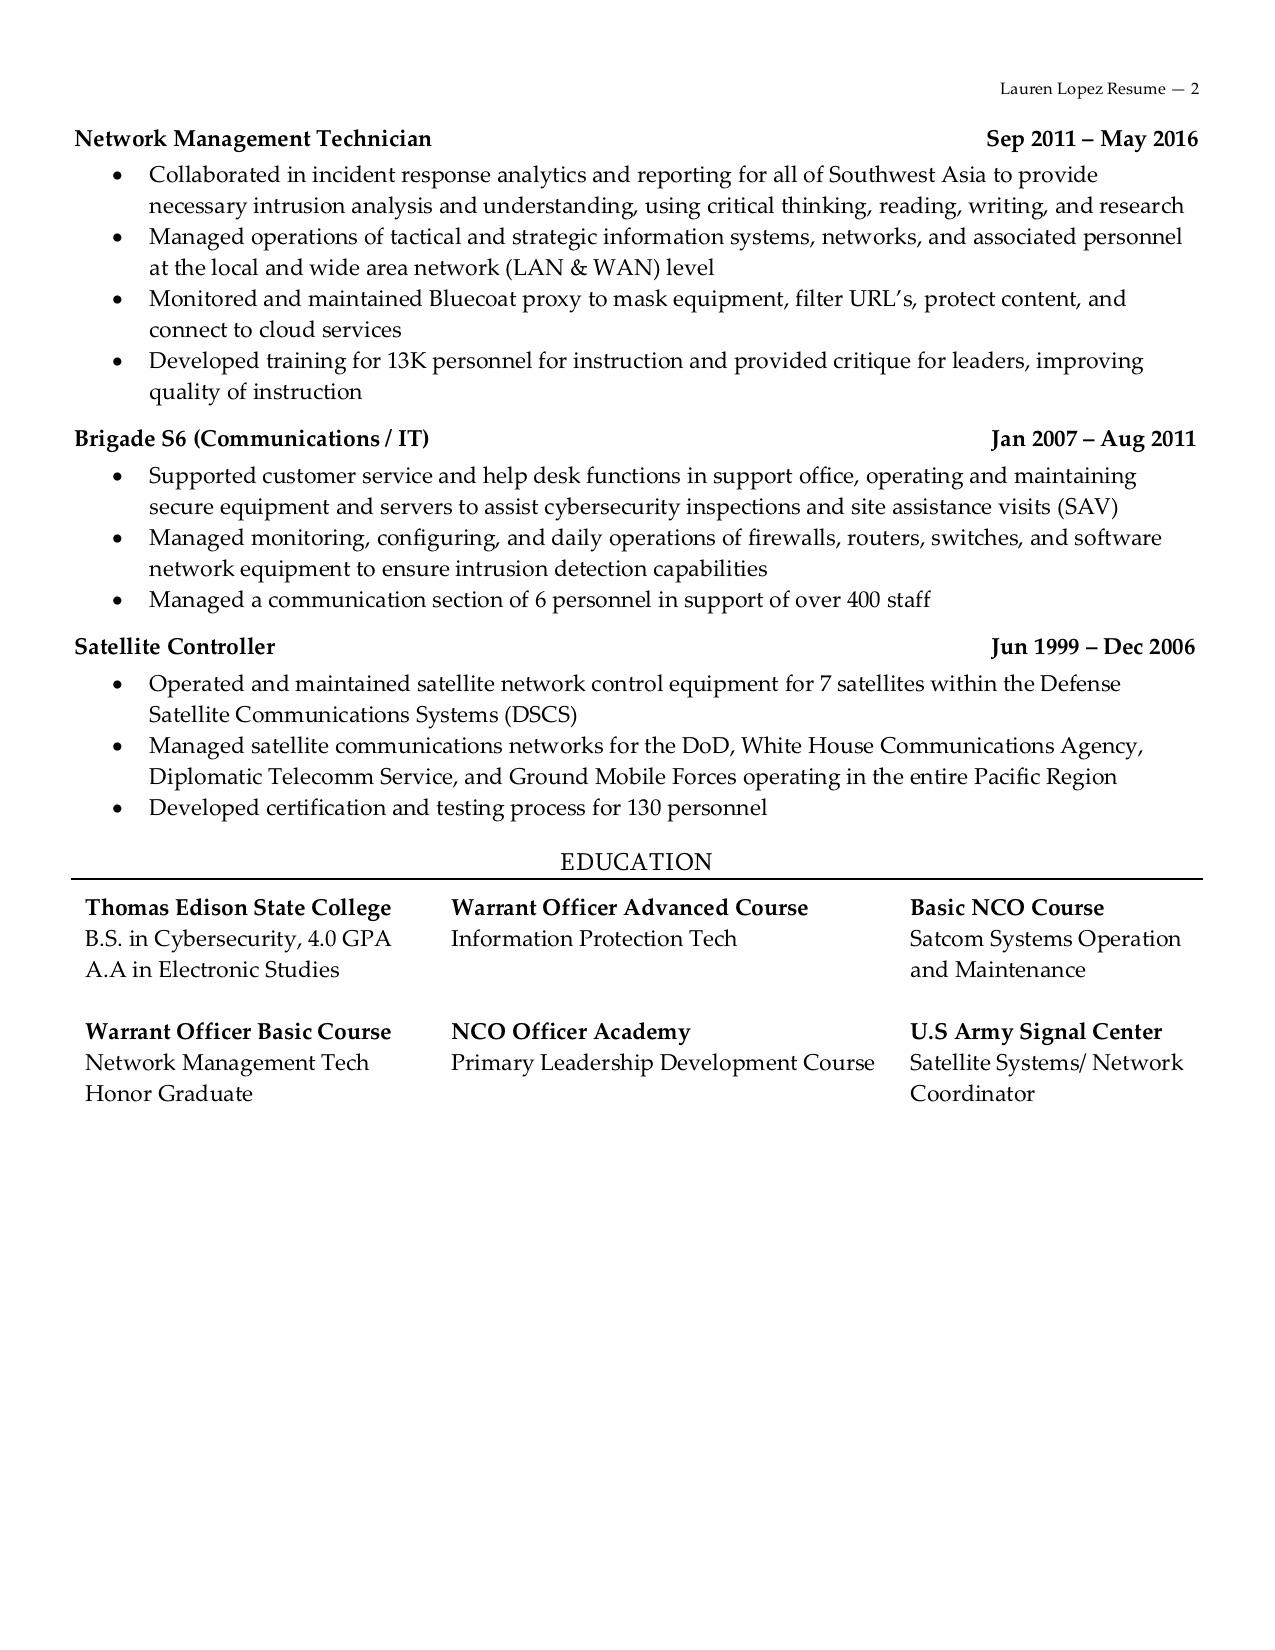 information security analyst resume  whitney shakespear